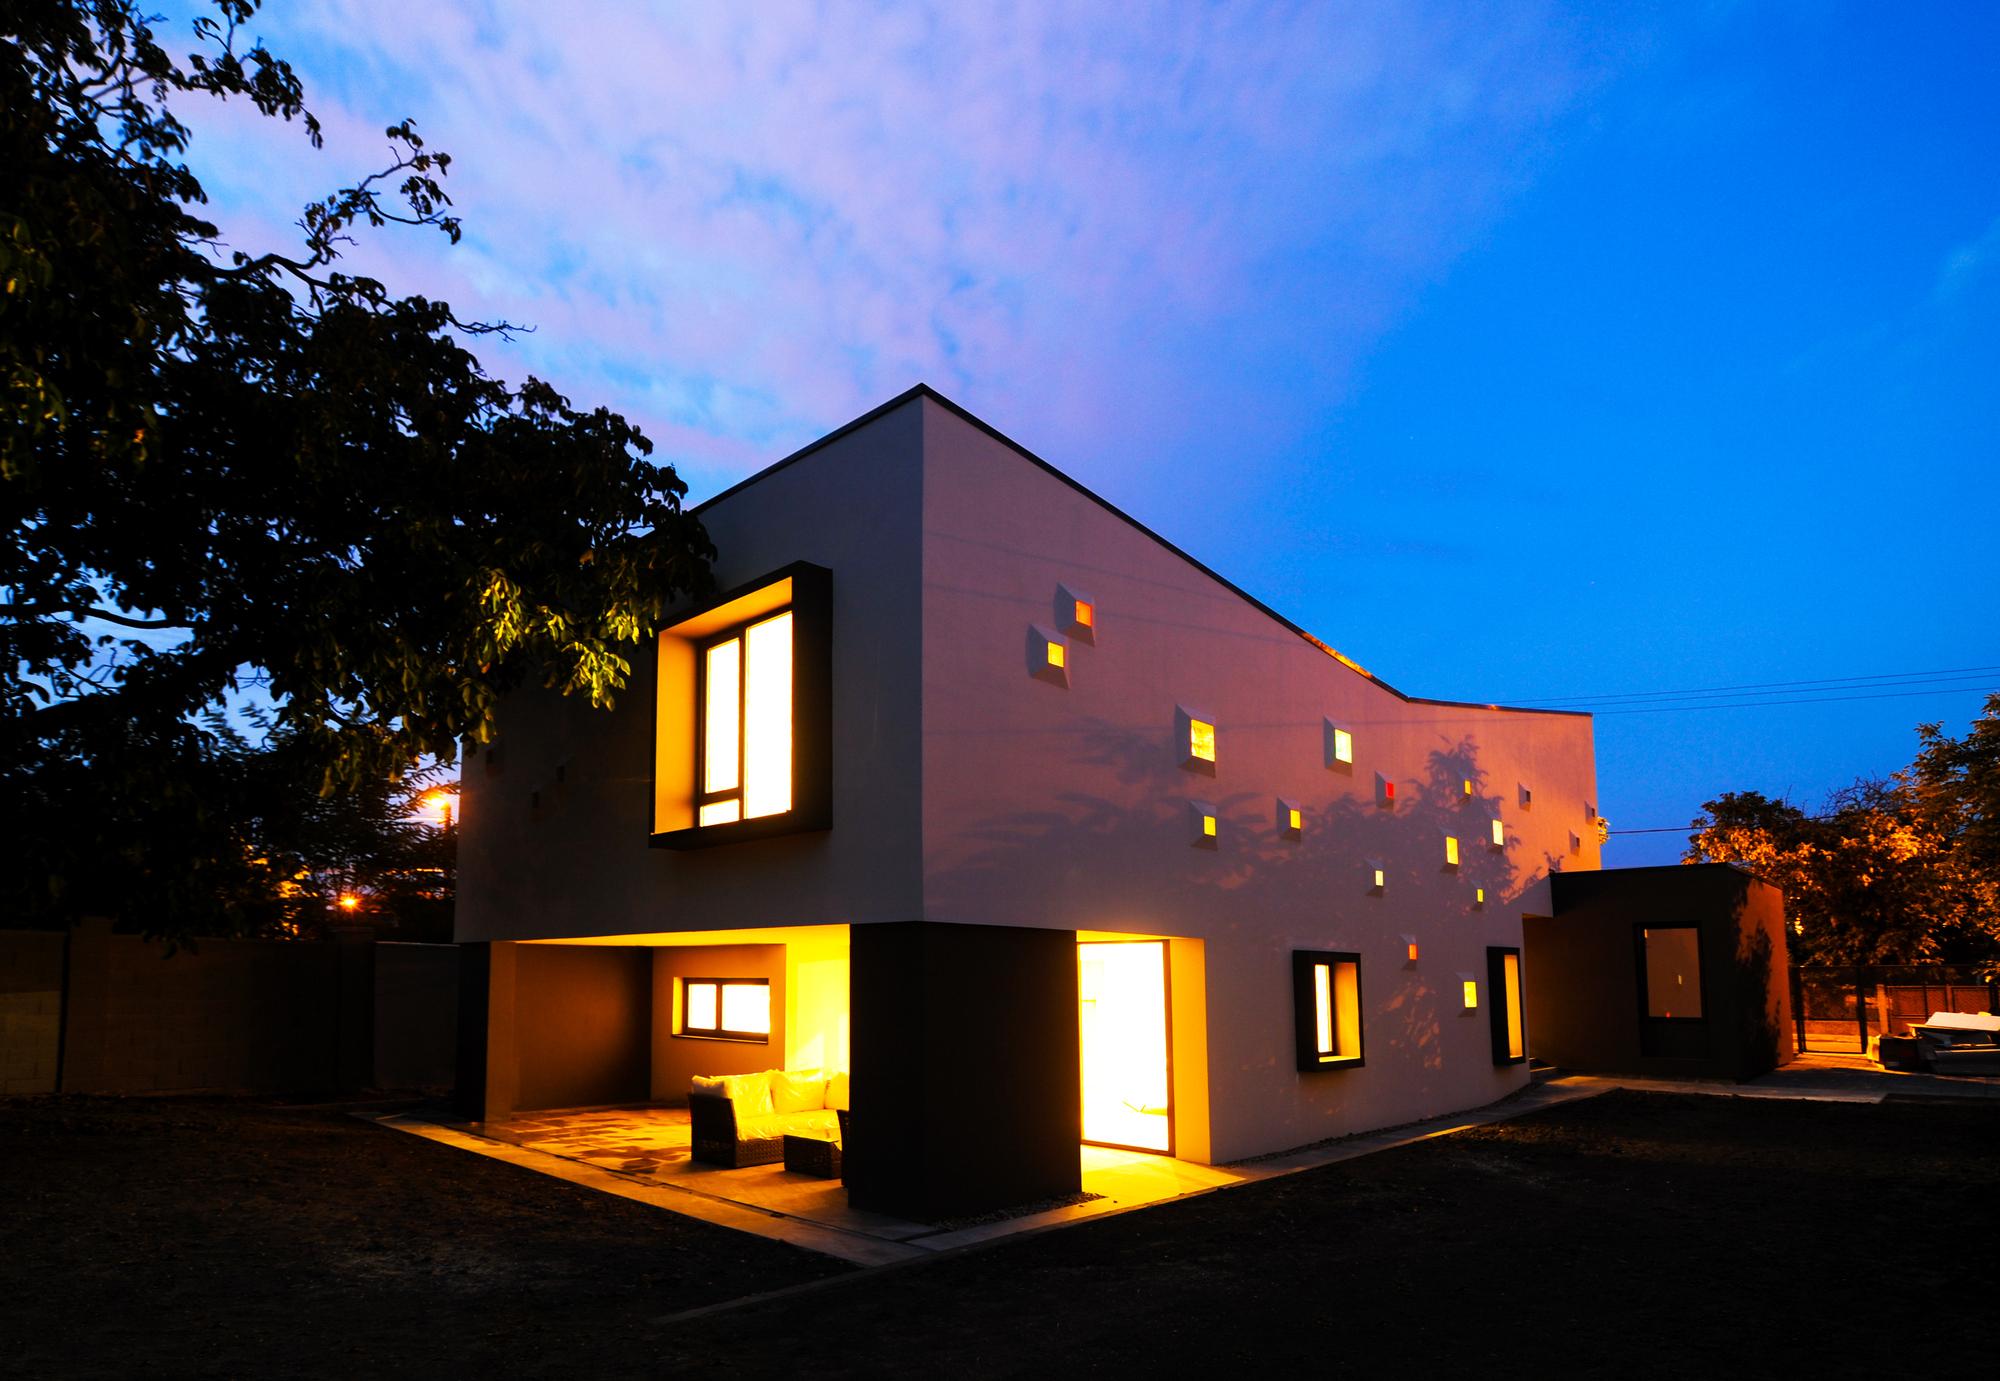 Una casa illuminata